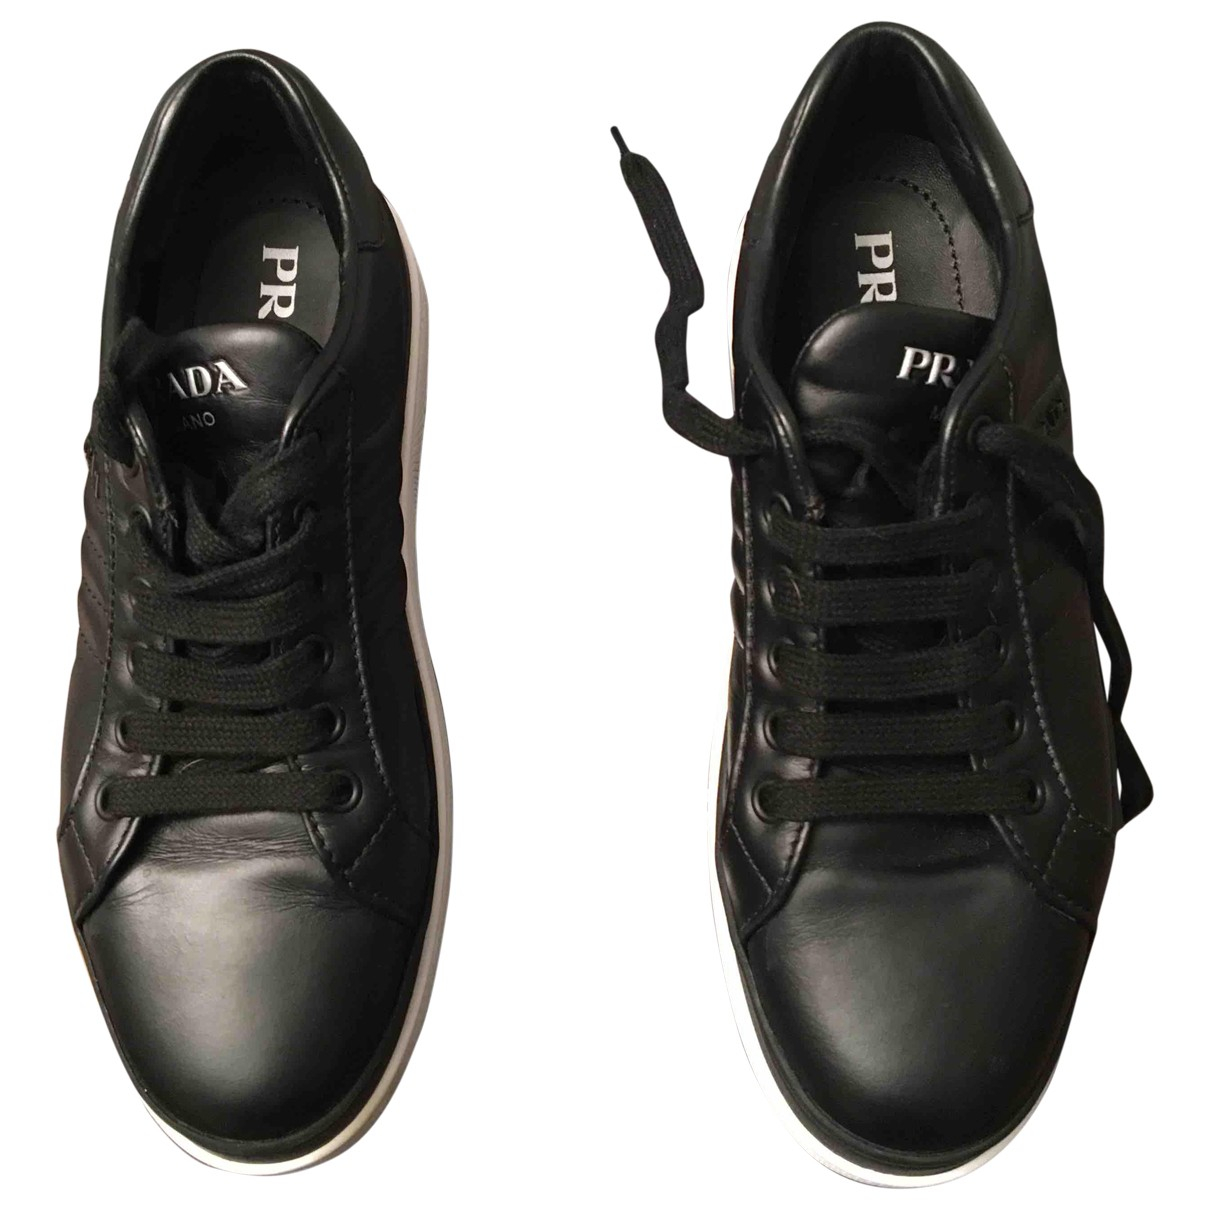 Prada \N Black Leather Trainers for Women 36.5 IT